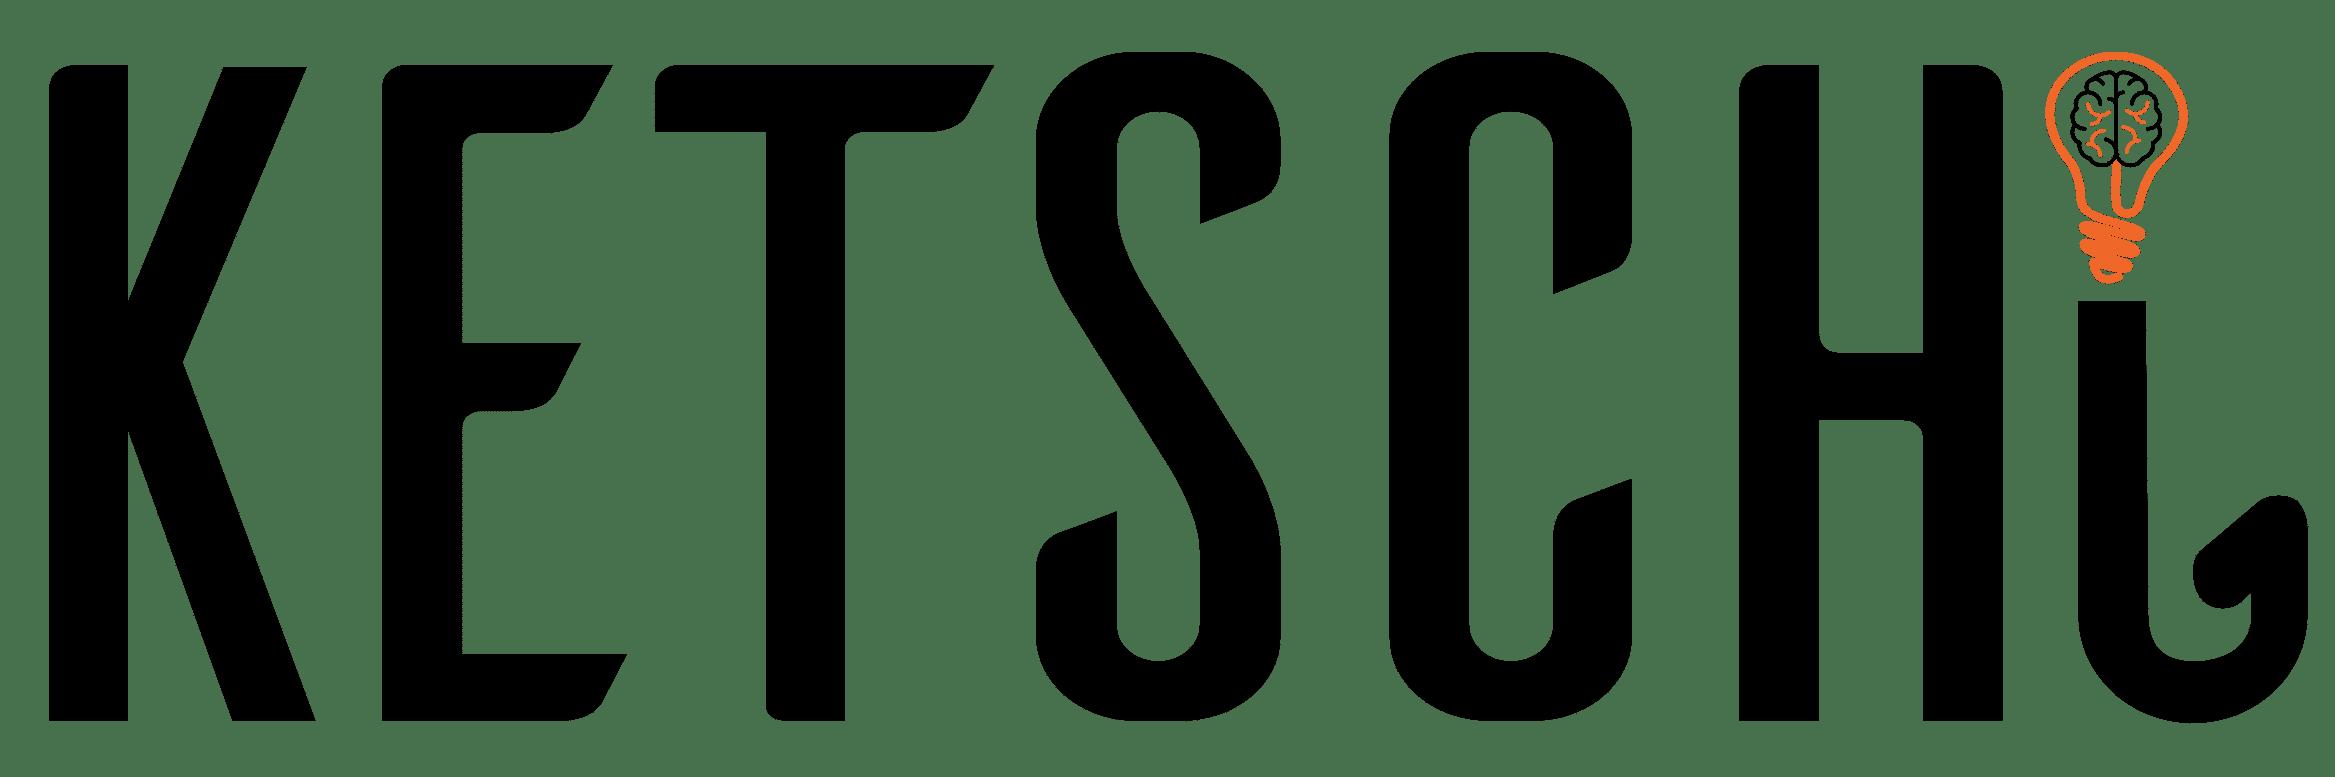 Ketschi logo